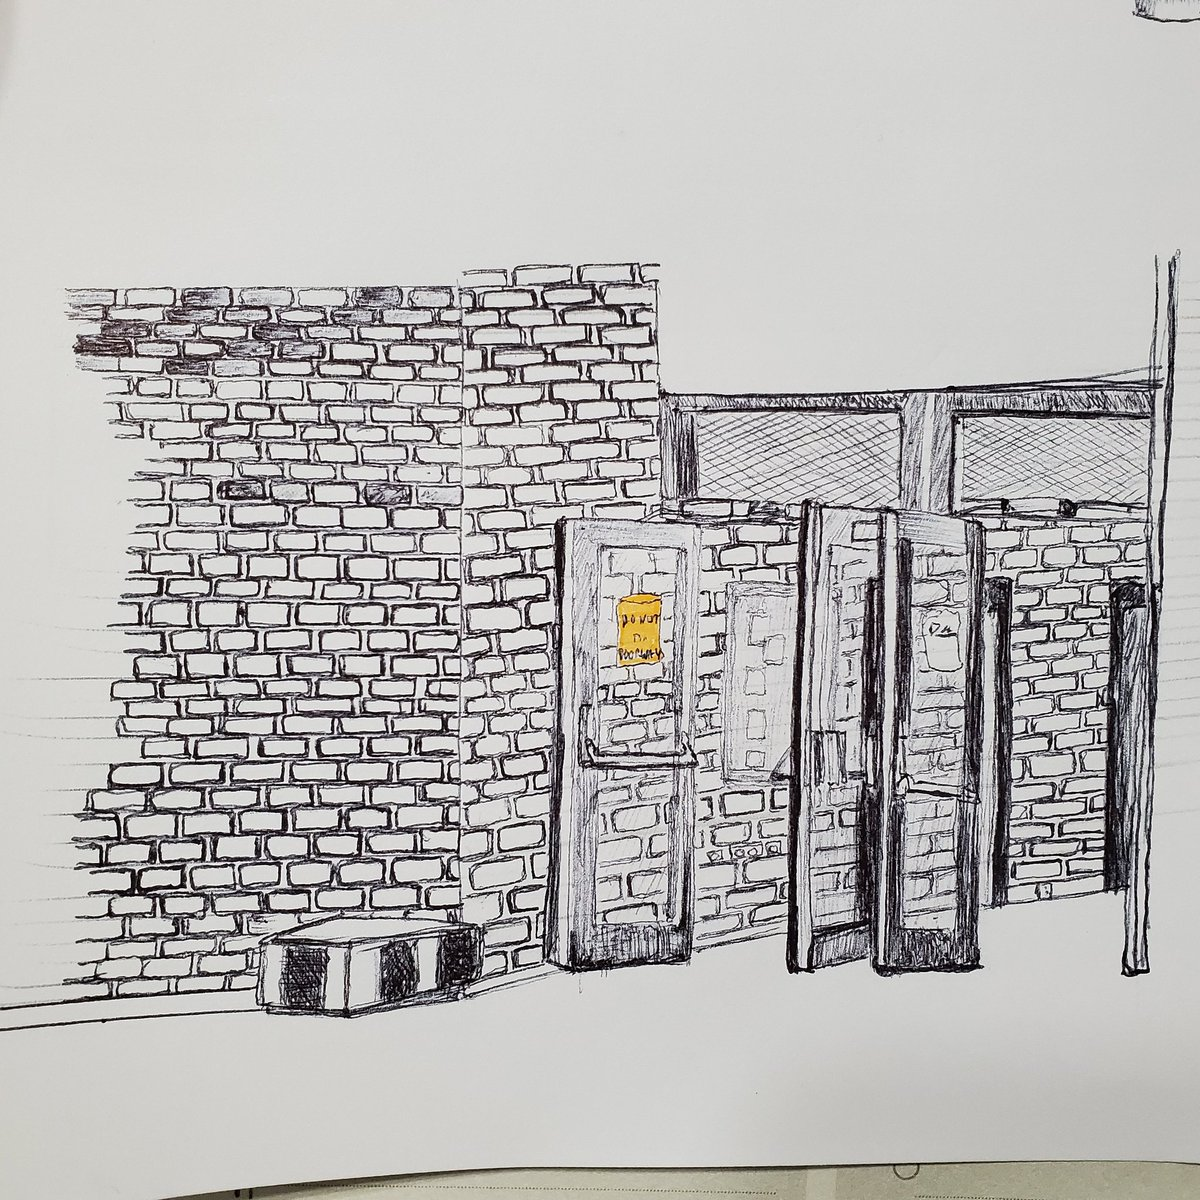 #urbansketching #boceto #sketch_daily #sketchbook #ink #dibujo #sketchoftheday #urban_sketch #doodleart #office #officesupplies #drawing #illustration #inspired #art #artwork #artsaves #black #ballpointpen #ballpointpendrawing #yellow #pen #miniaturepainting #light #designpic.twitter.com/Em5mlekauK